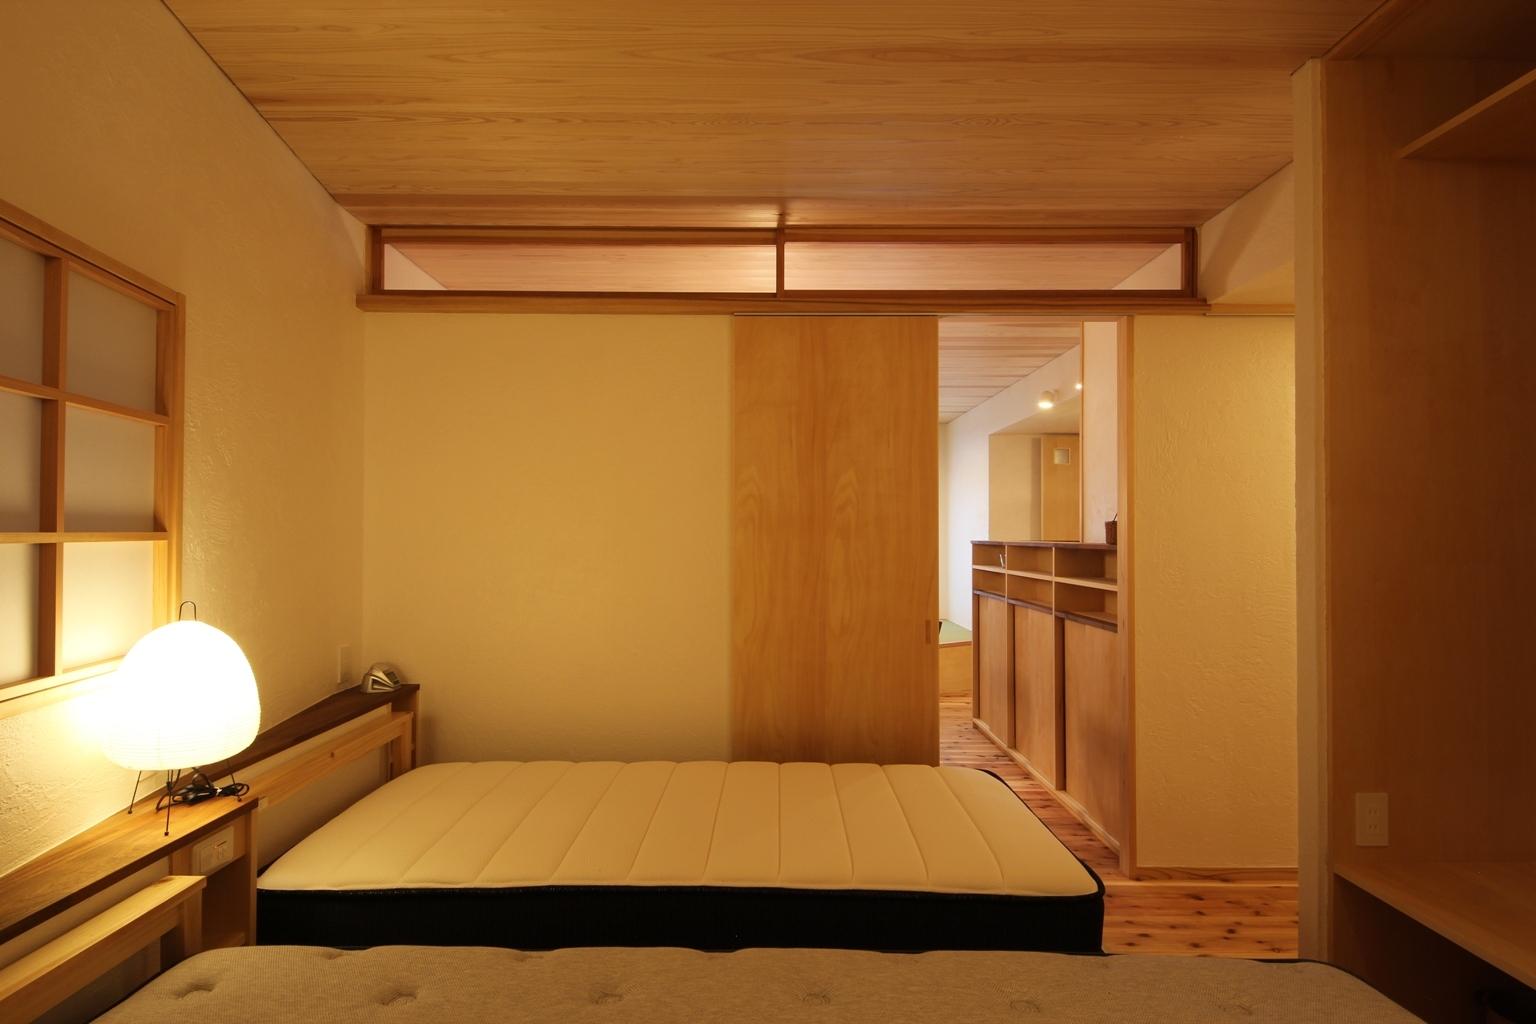 桜台の家改修 写真紹介_c0310571_17273441.jpg